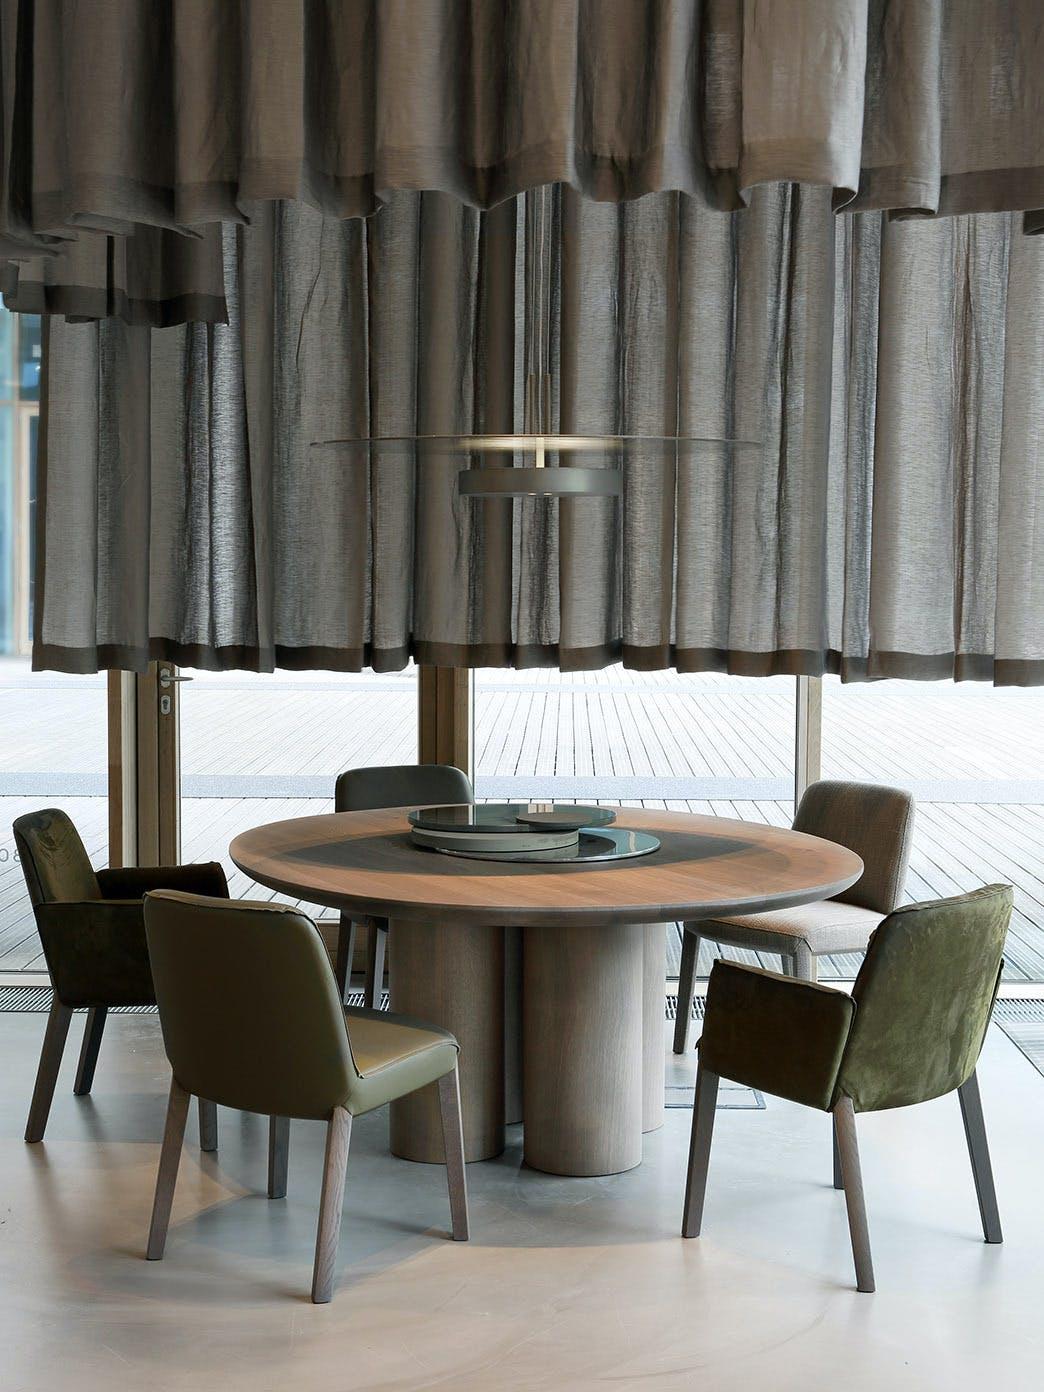 Product Design Dining Milan Furniture Fair 2017 Olle Table Minne Chair Ec 006 Tall